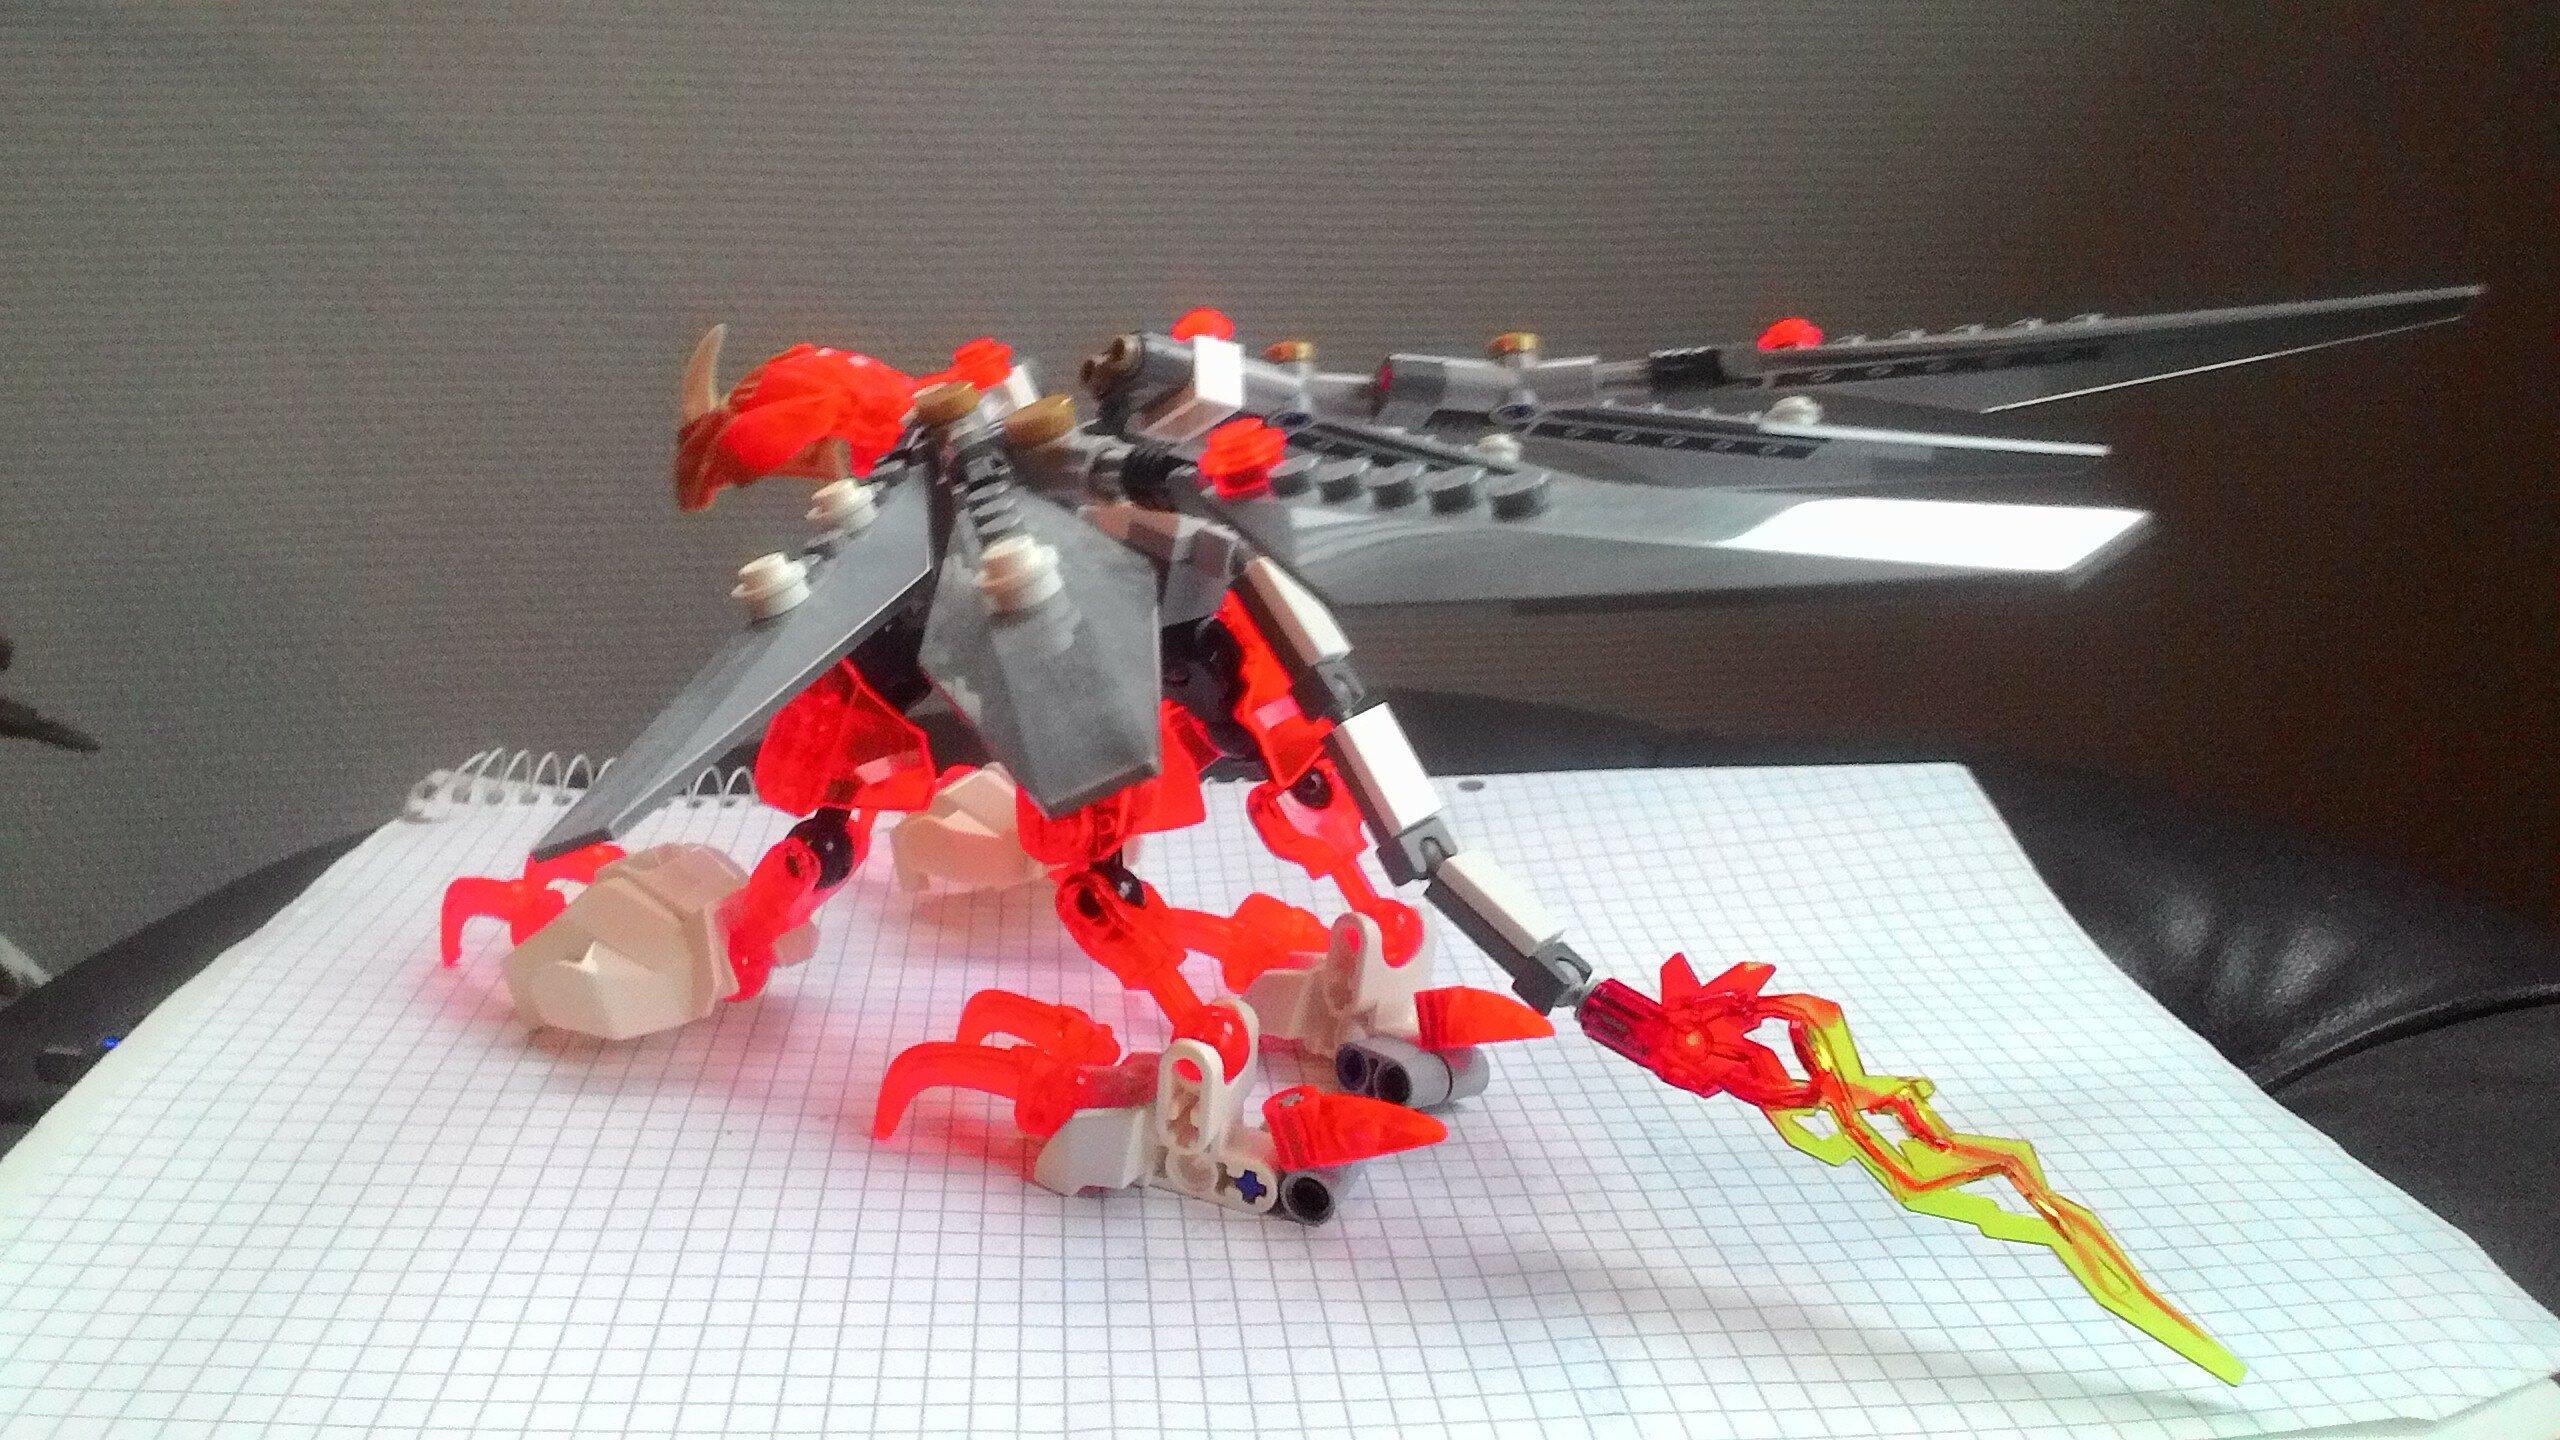 Elemental Creature Of Plasma Daicore Lego Creations The Ttv